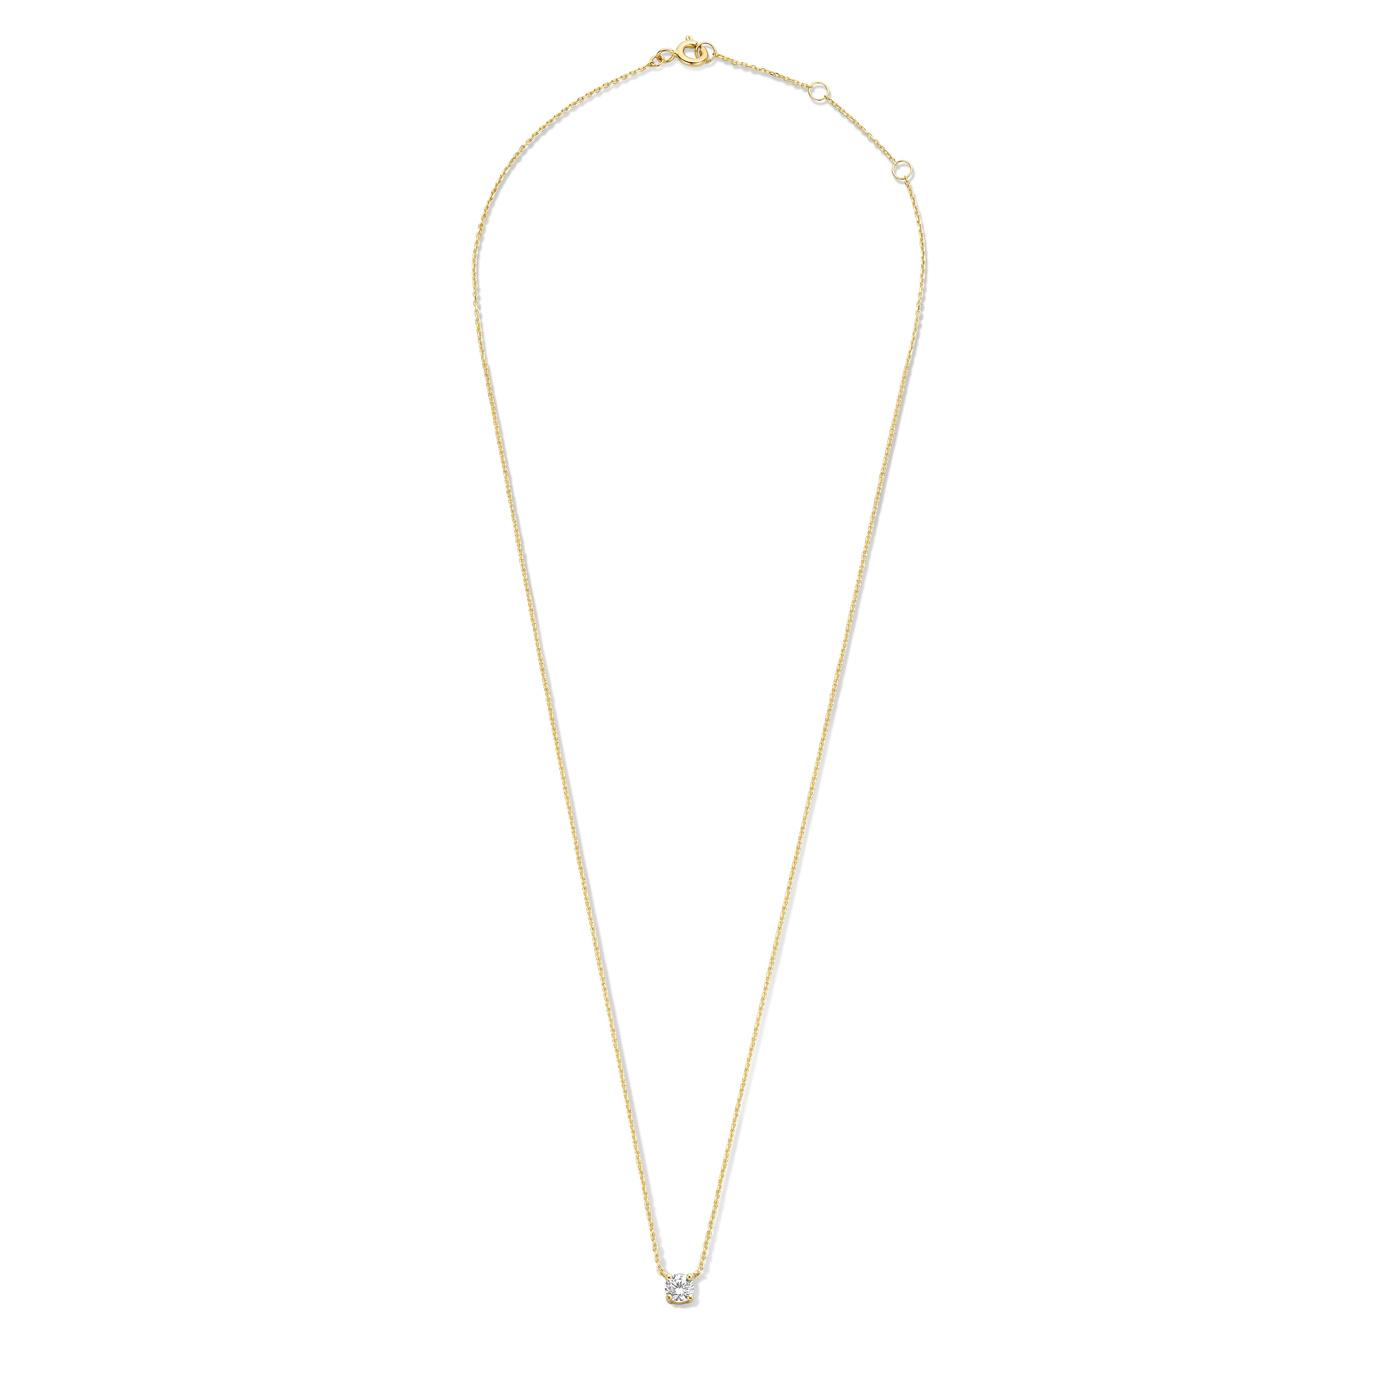 Isabel Bernard Le Marais Garance 14 karat gold necklace with zirconia